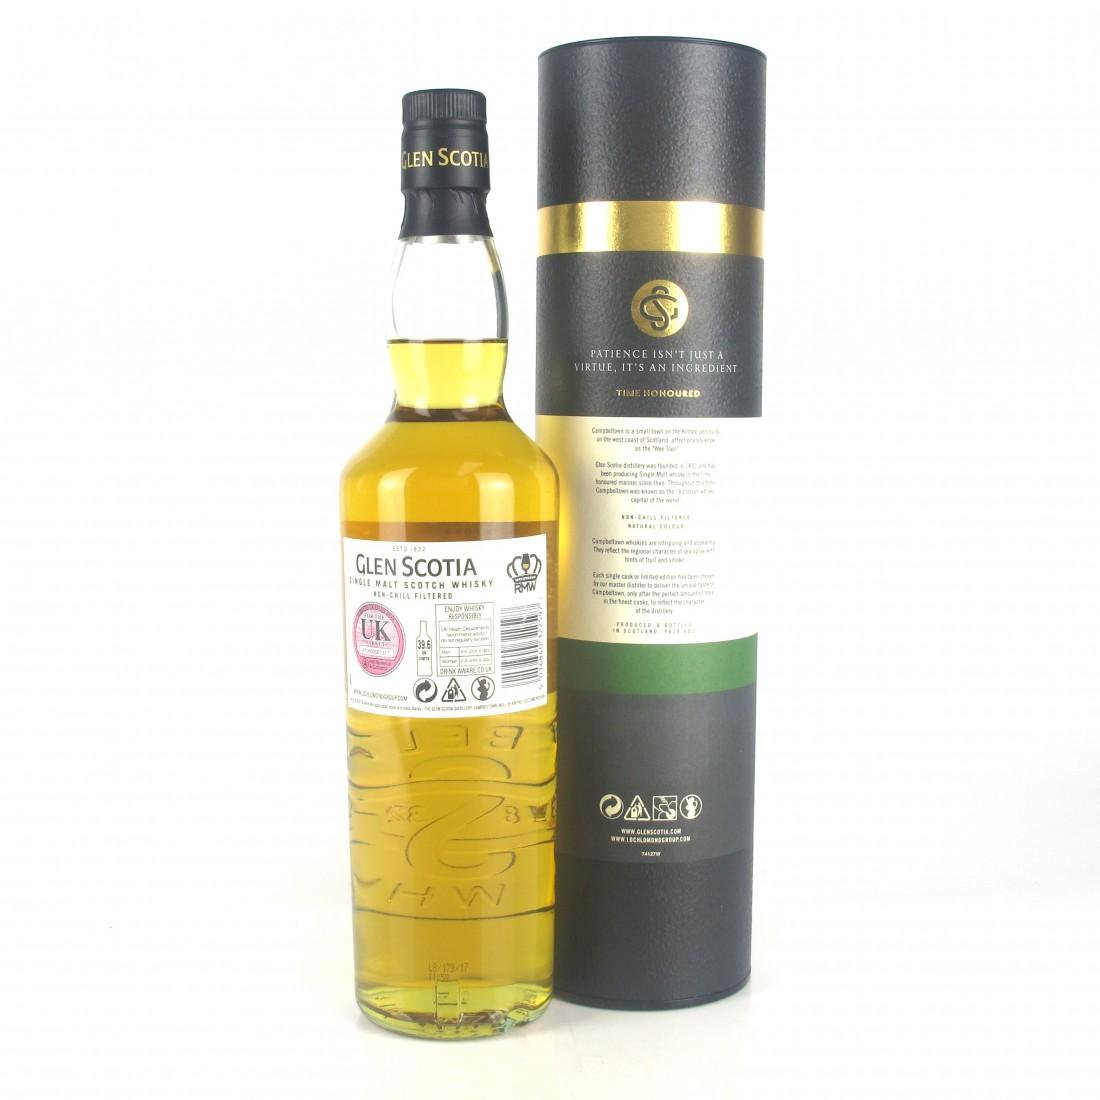 Glen Scotia 2006 Single Cask #529 / Royal Mile Whiskies Exclusive